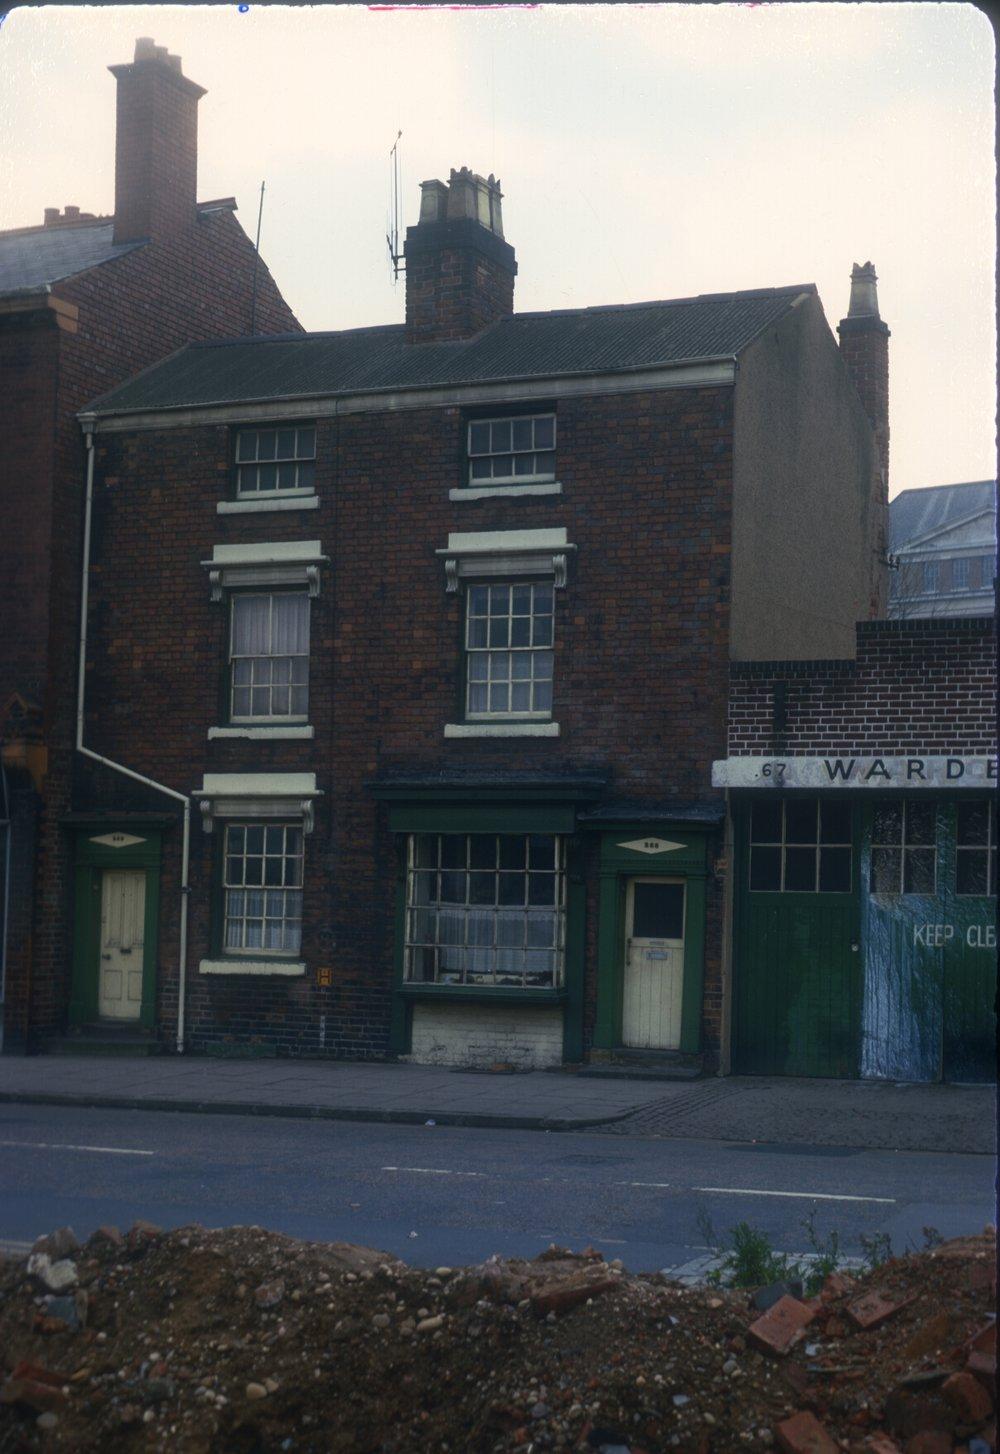 Five Ways, Edgbaston (258-259 Ladywood Road. Wardells Garage - Former Dairy) 3rd December 1967